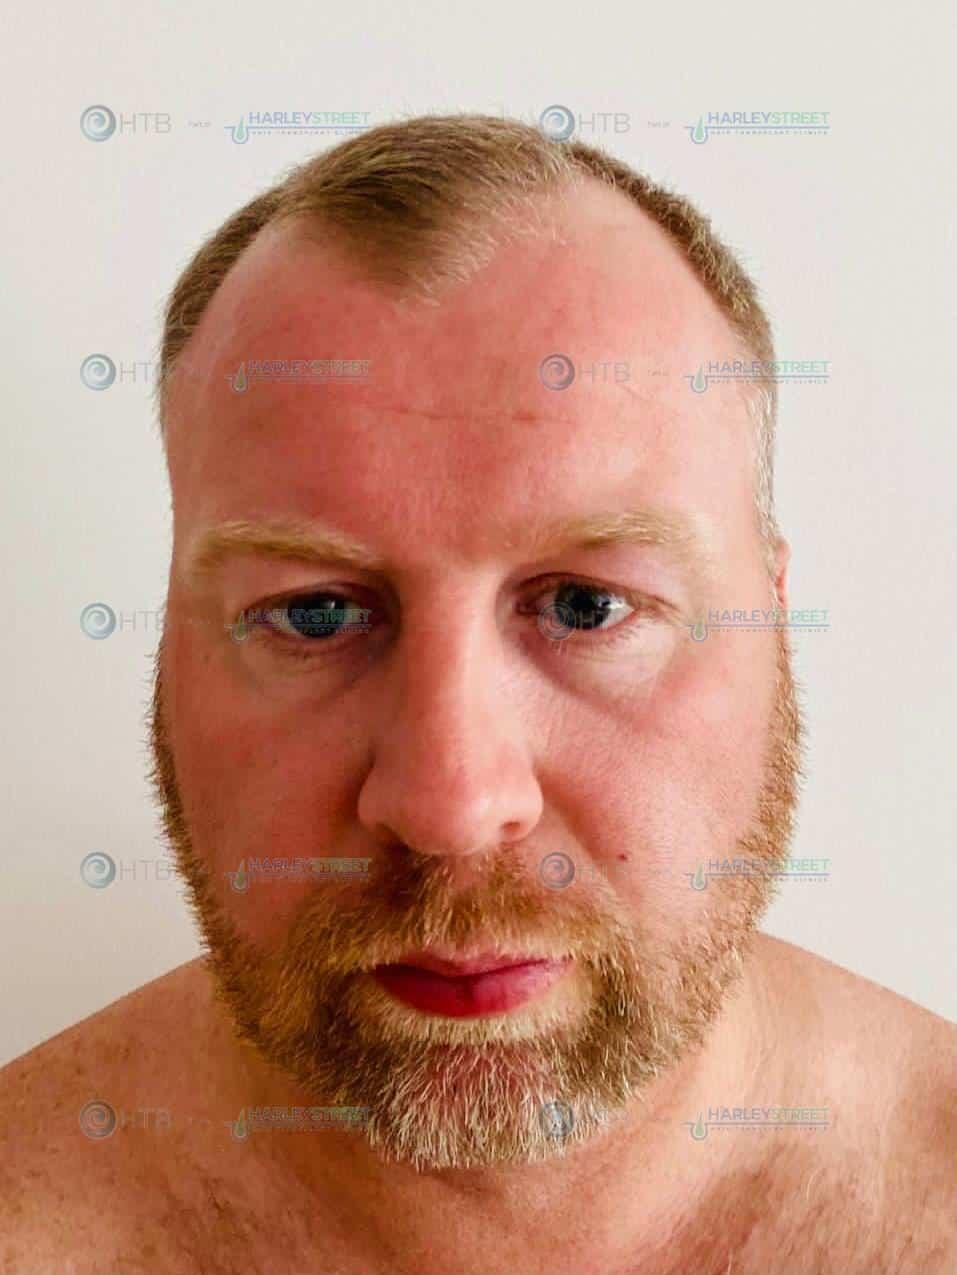 Hair Transplant Birmingham of HSHTC client before procedure